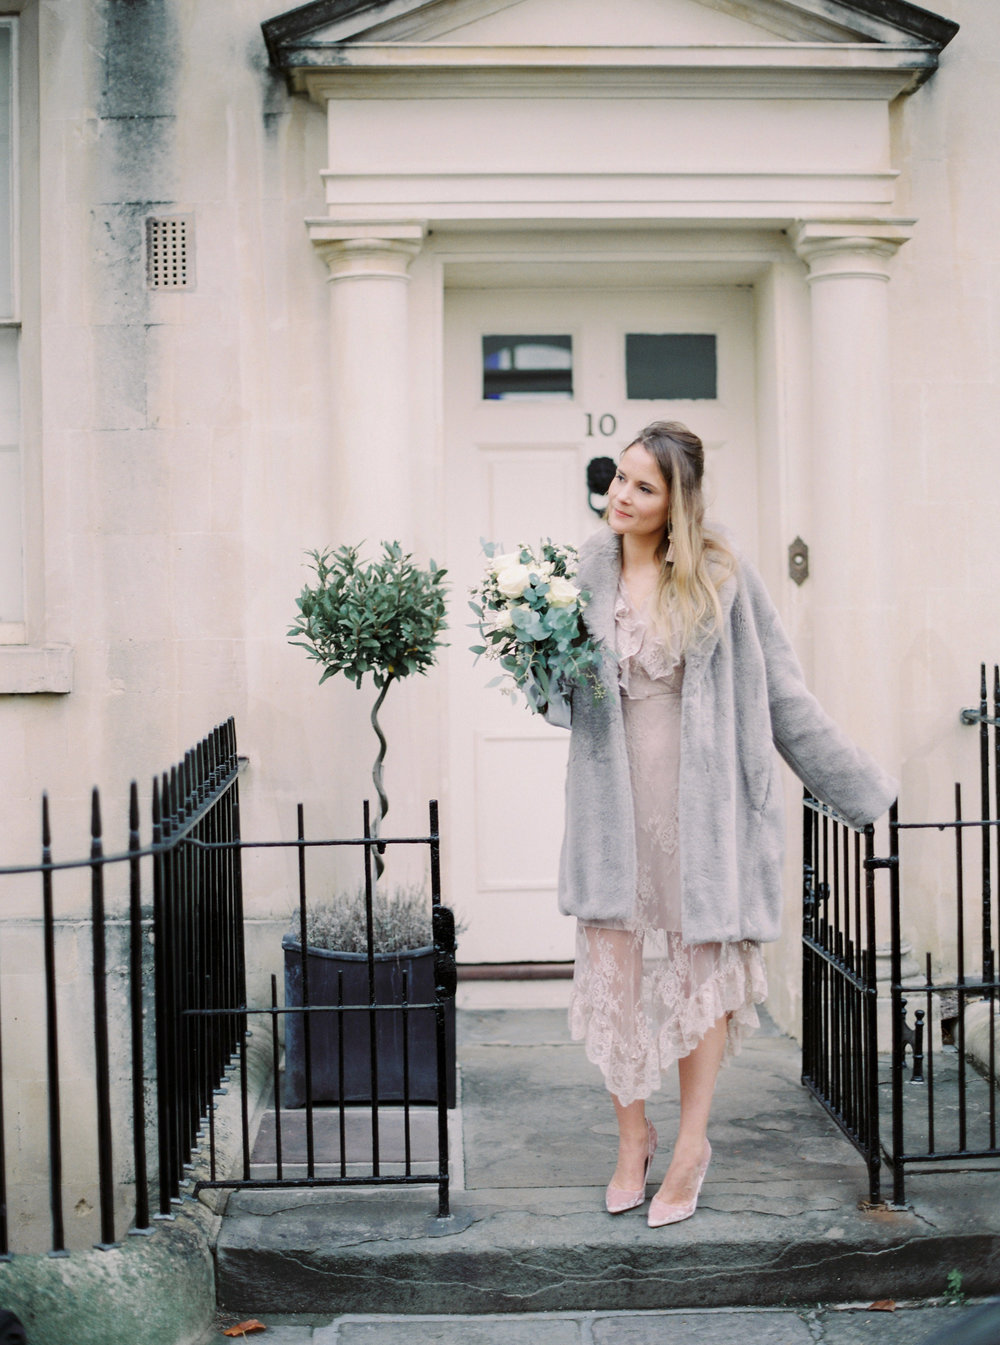 Luxury Wedding Planner UK | Our Chic & Romantic Engagement Shoot in Bath | Katie Julia Photography - 4.JPG